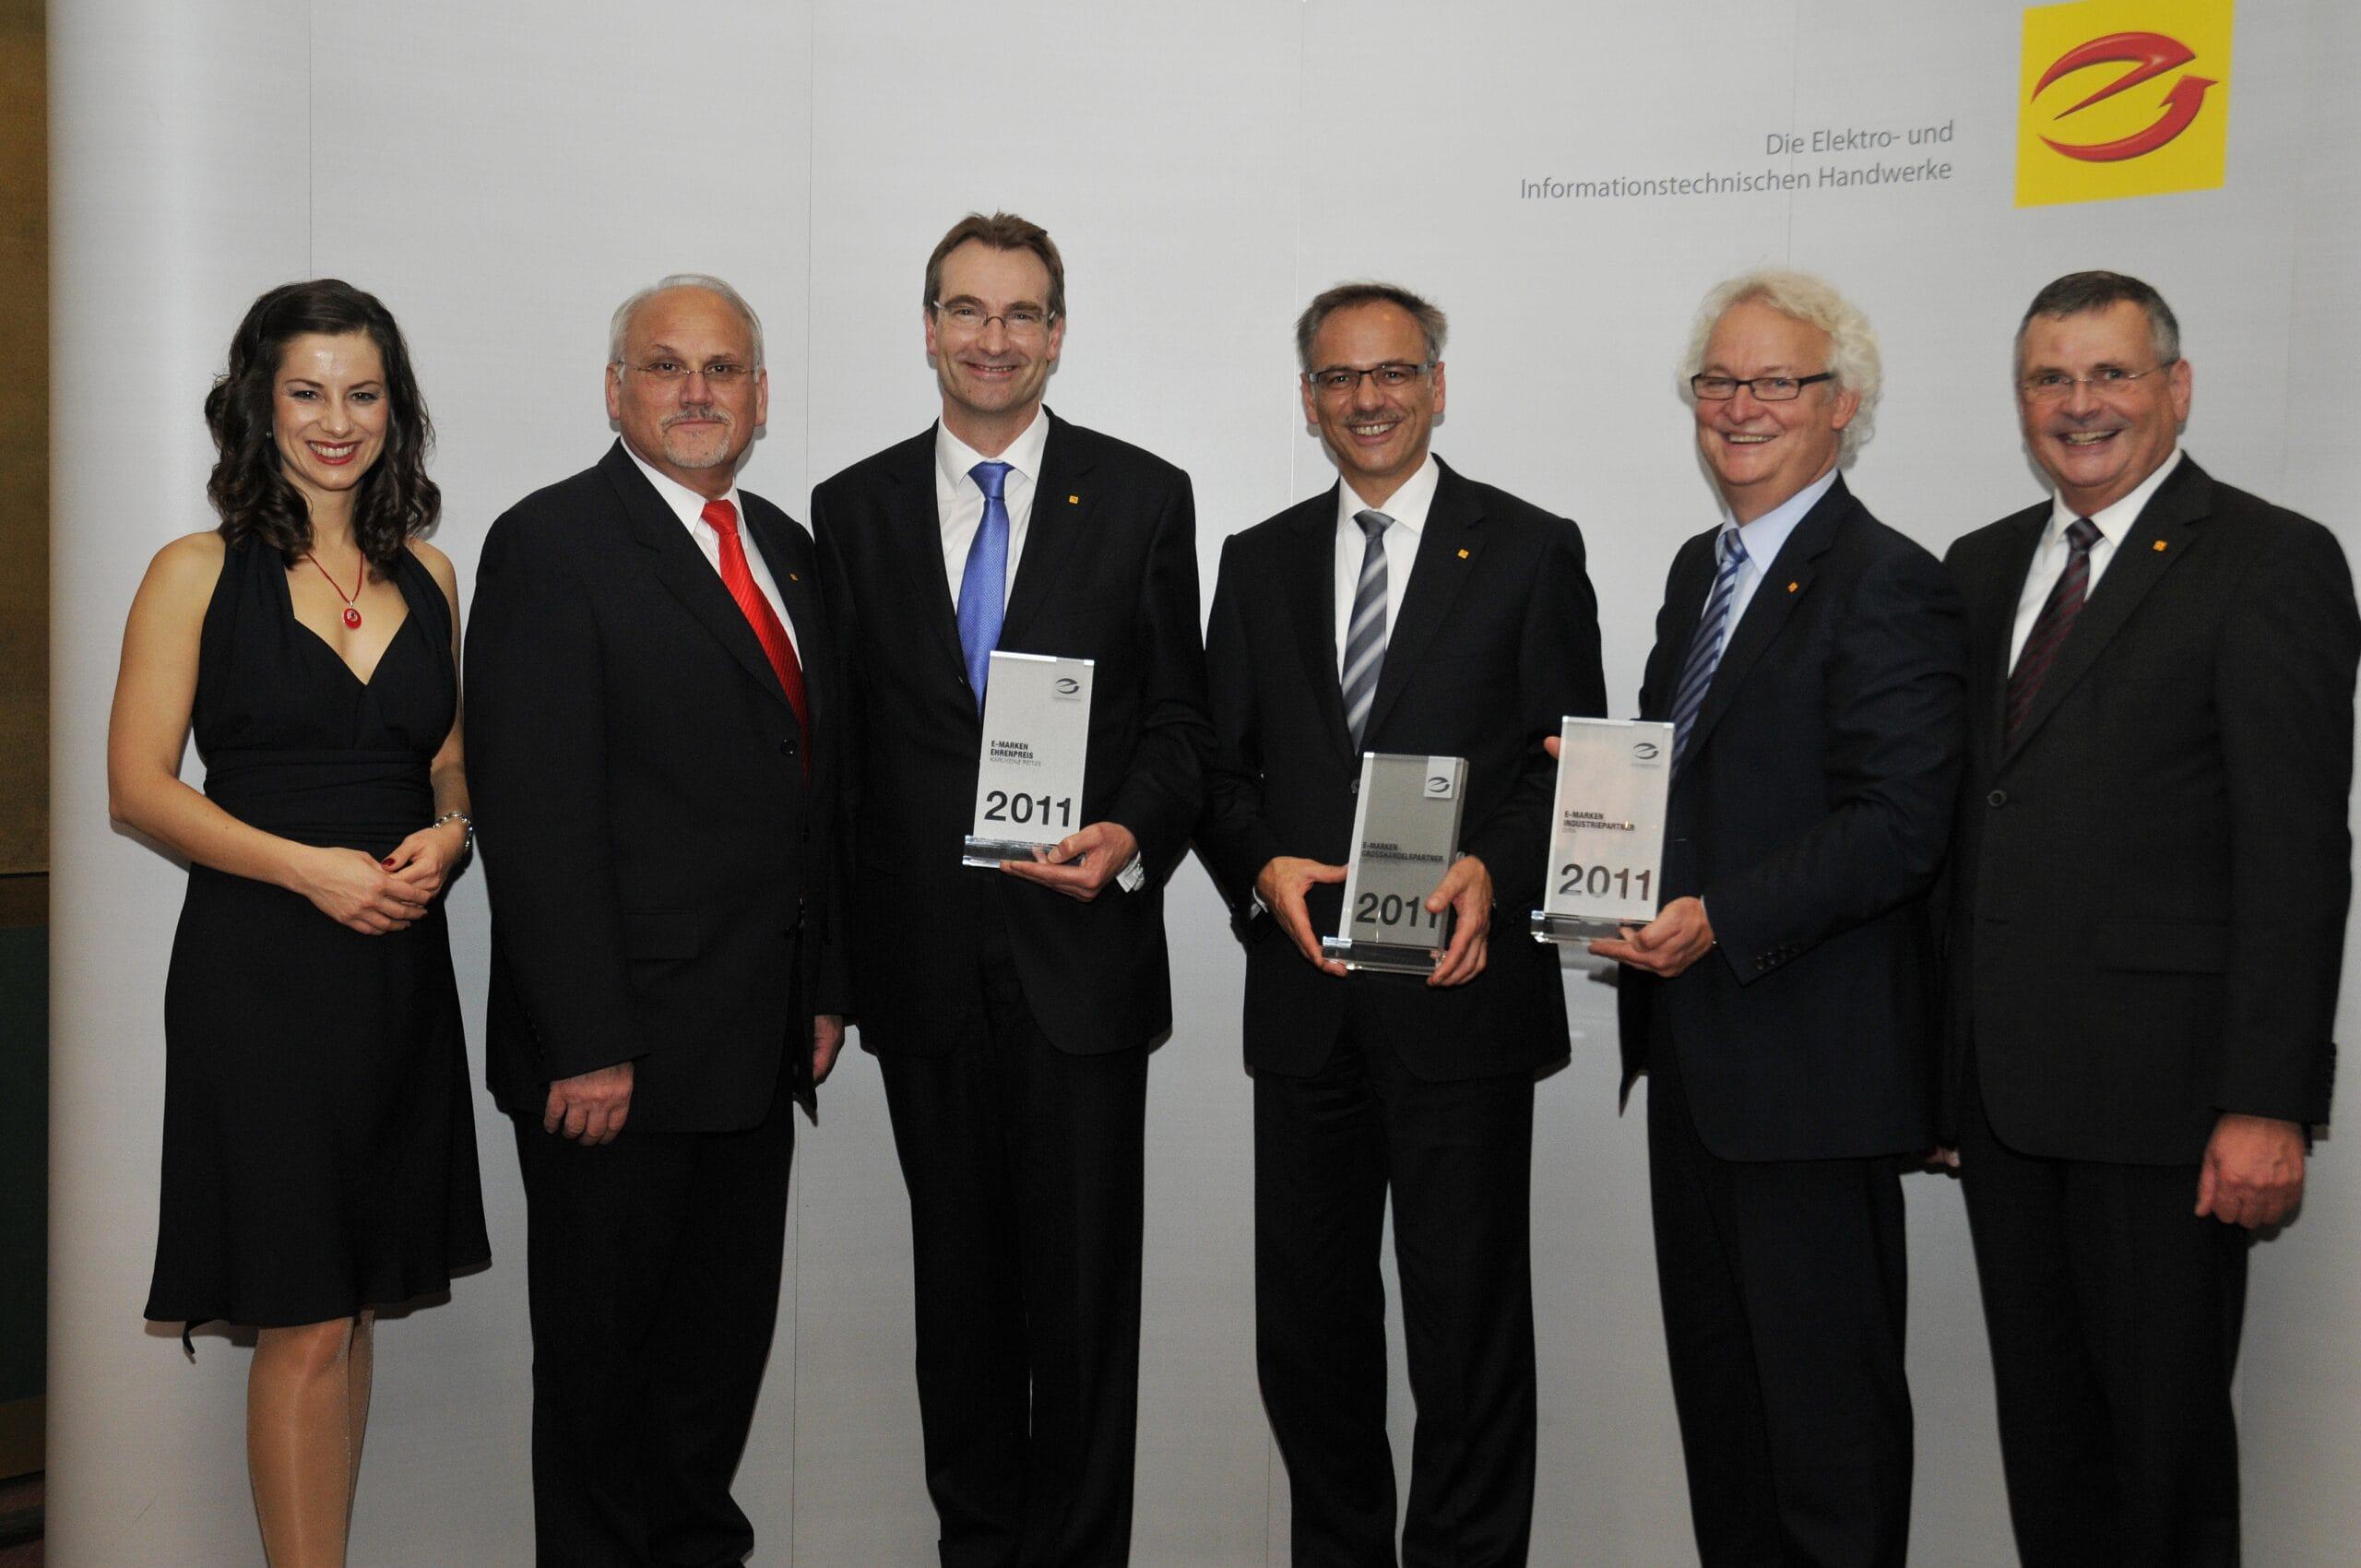 E-Markenpartner-Preis verliehen